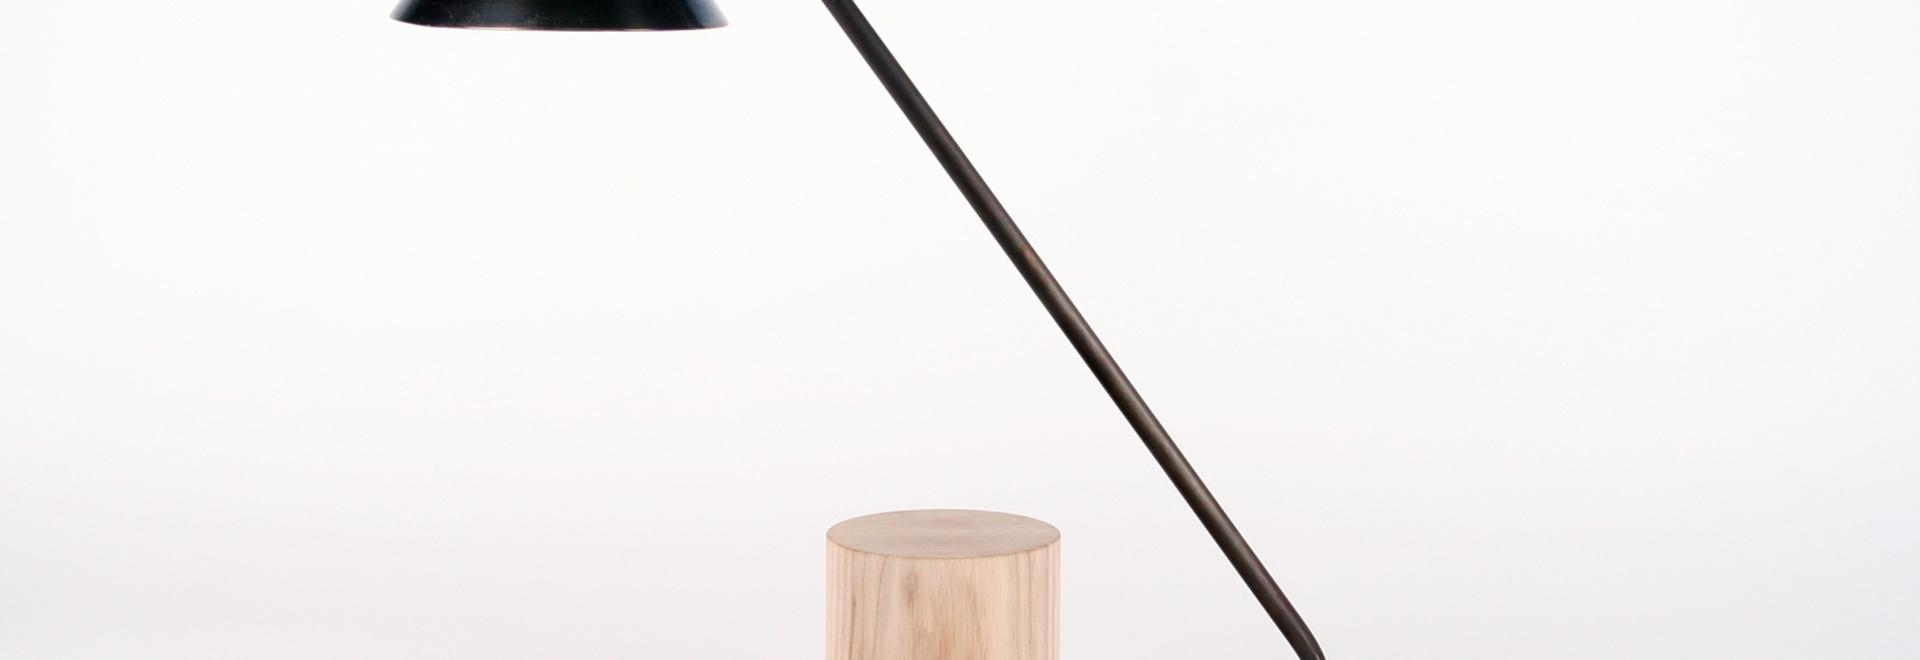 Theorem-Cerused Lamp by DAMM